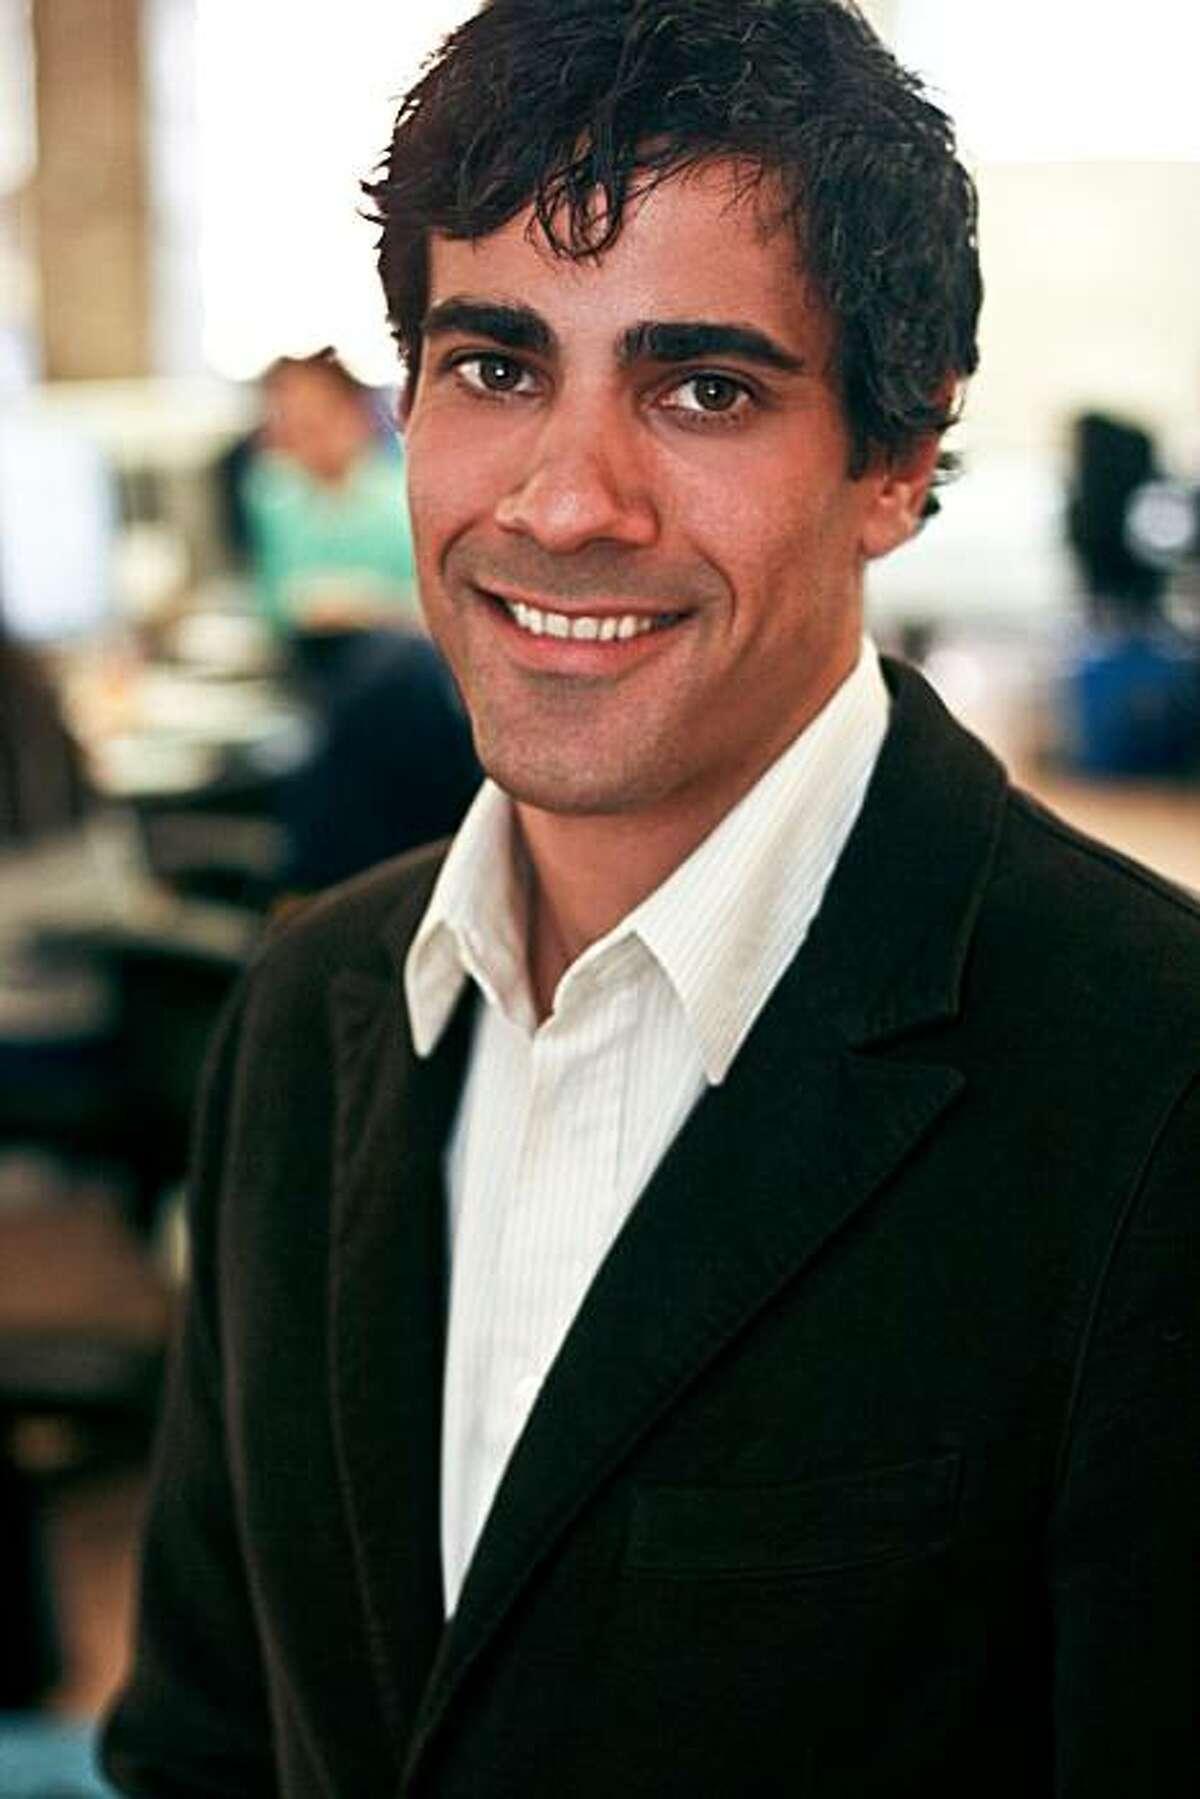 Jeremy Stoppelman, CEO of Yelp, San Francisco